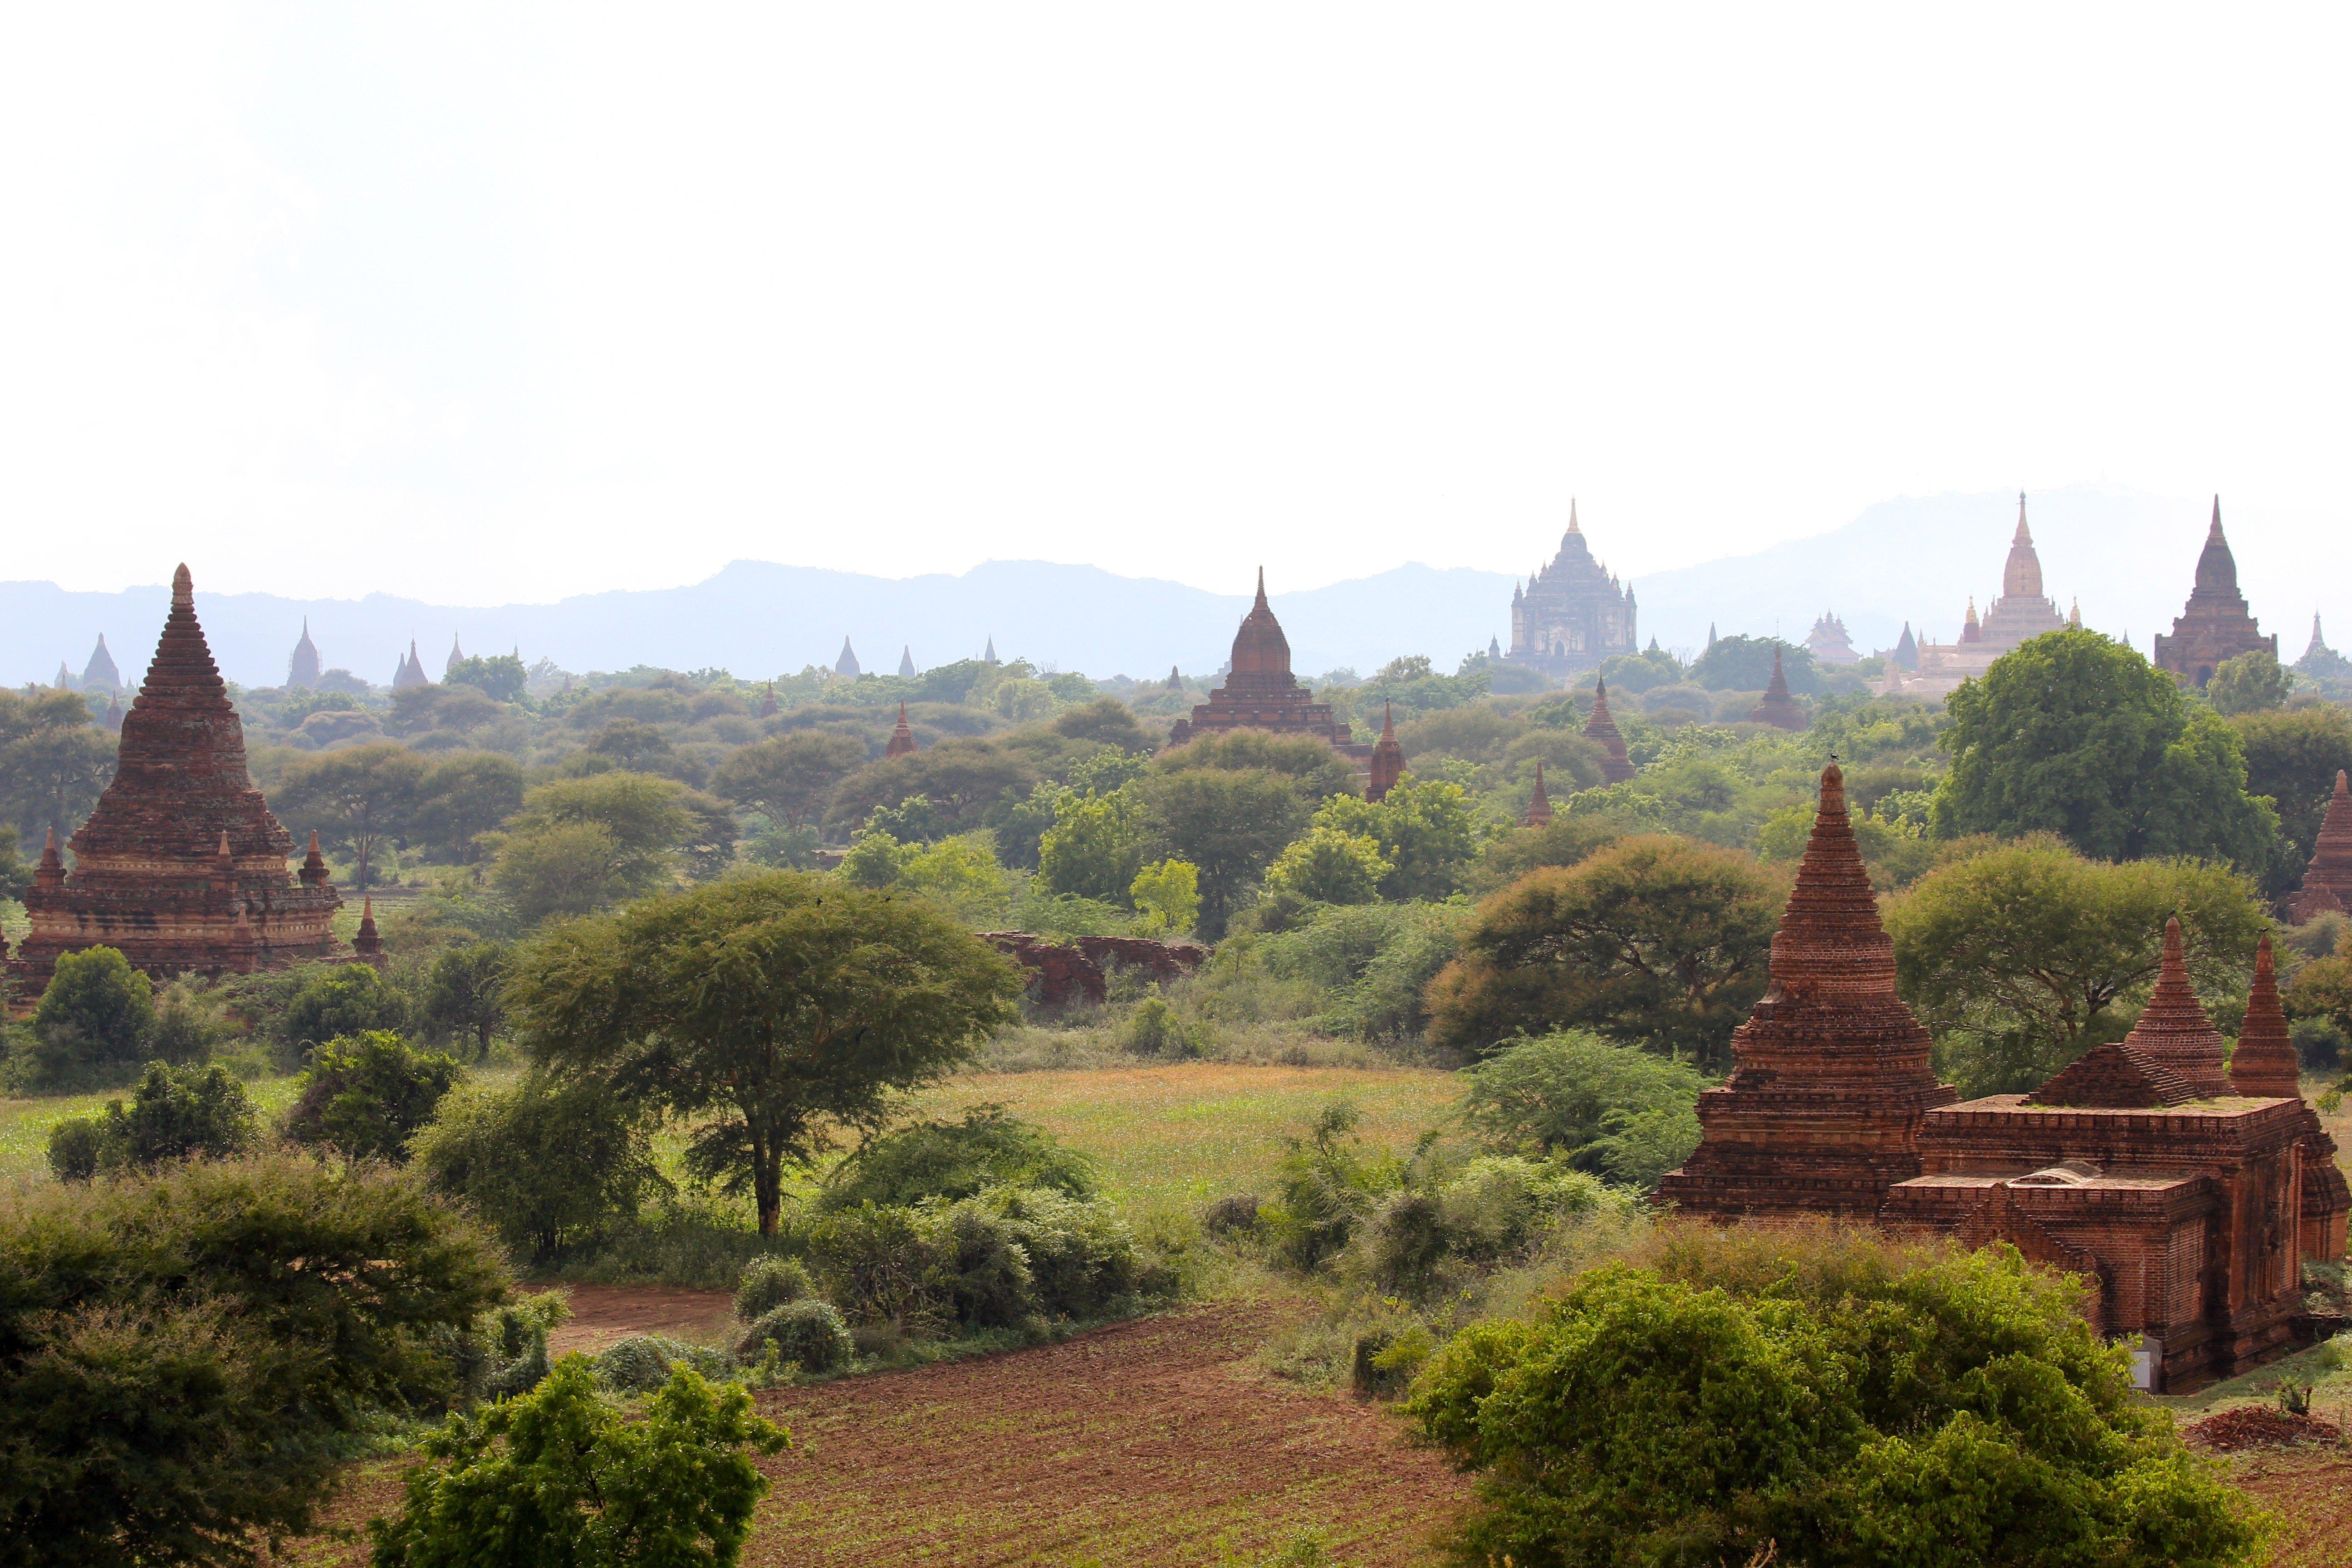 Bagan Birma Wteiwewtamte Pl Monument Valley Natural Landmarks Monument